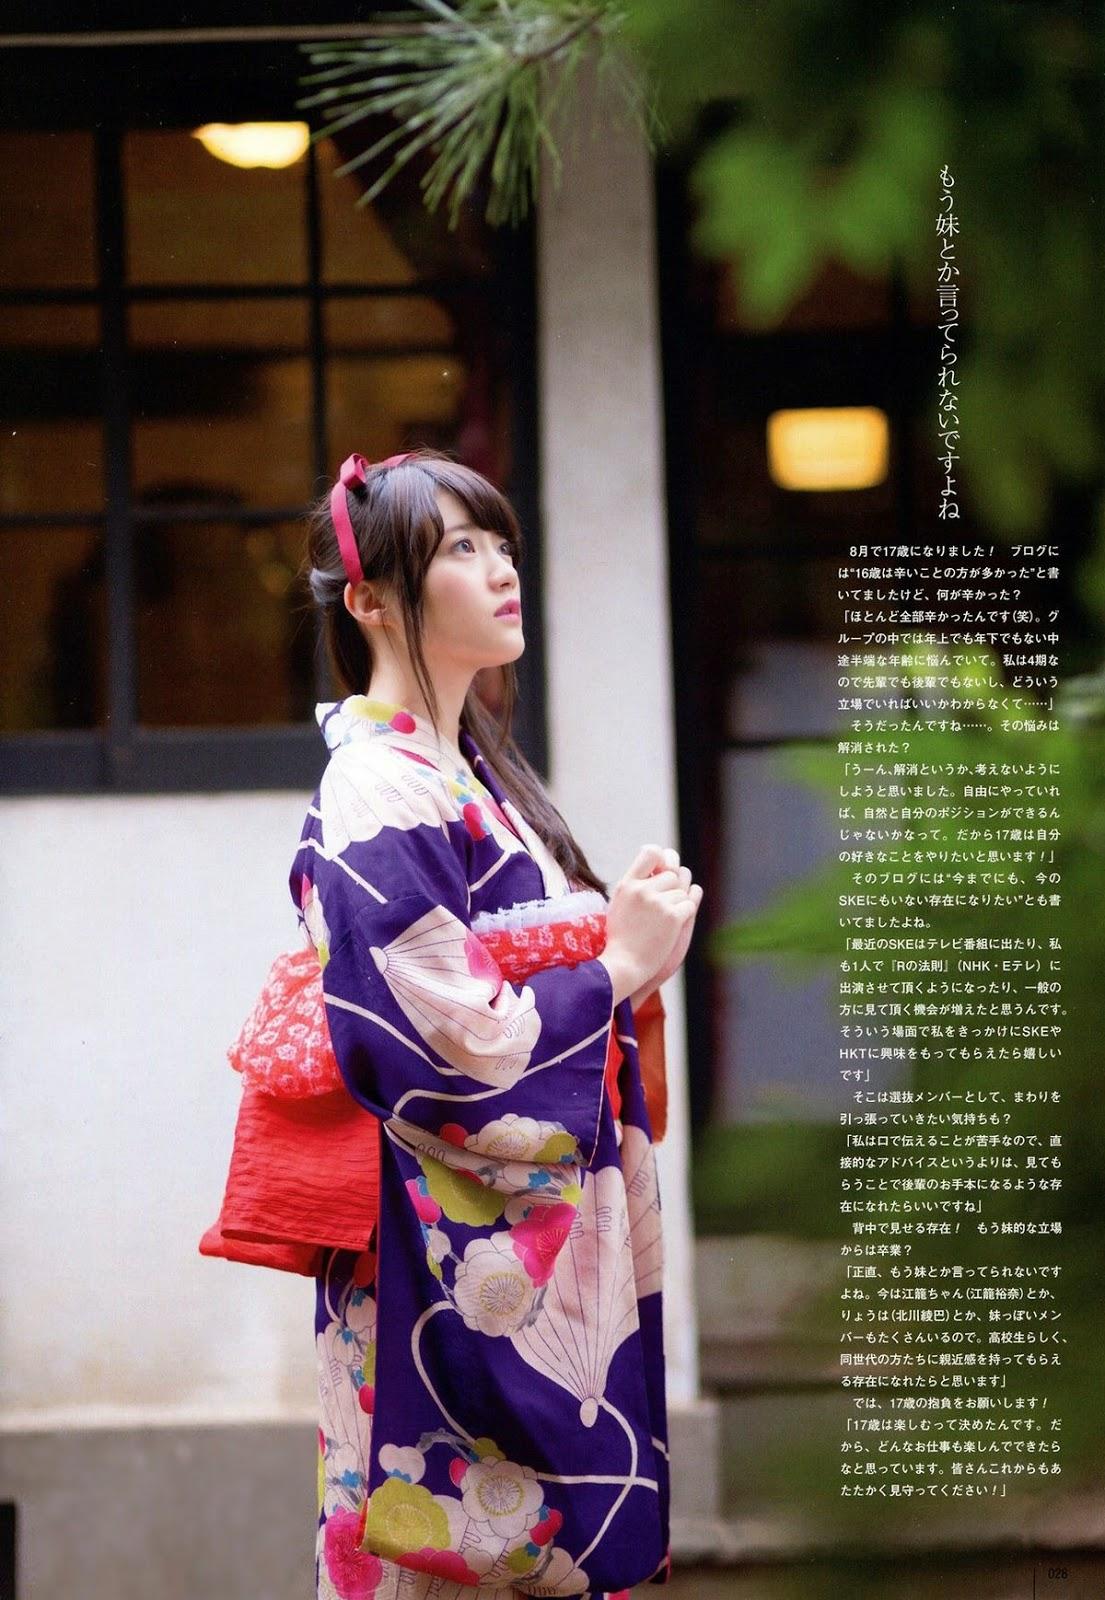 Idol japonés desnudo